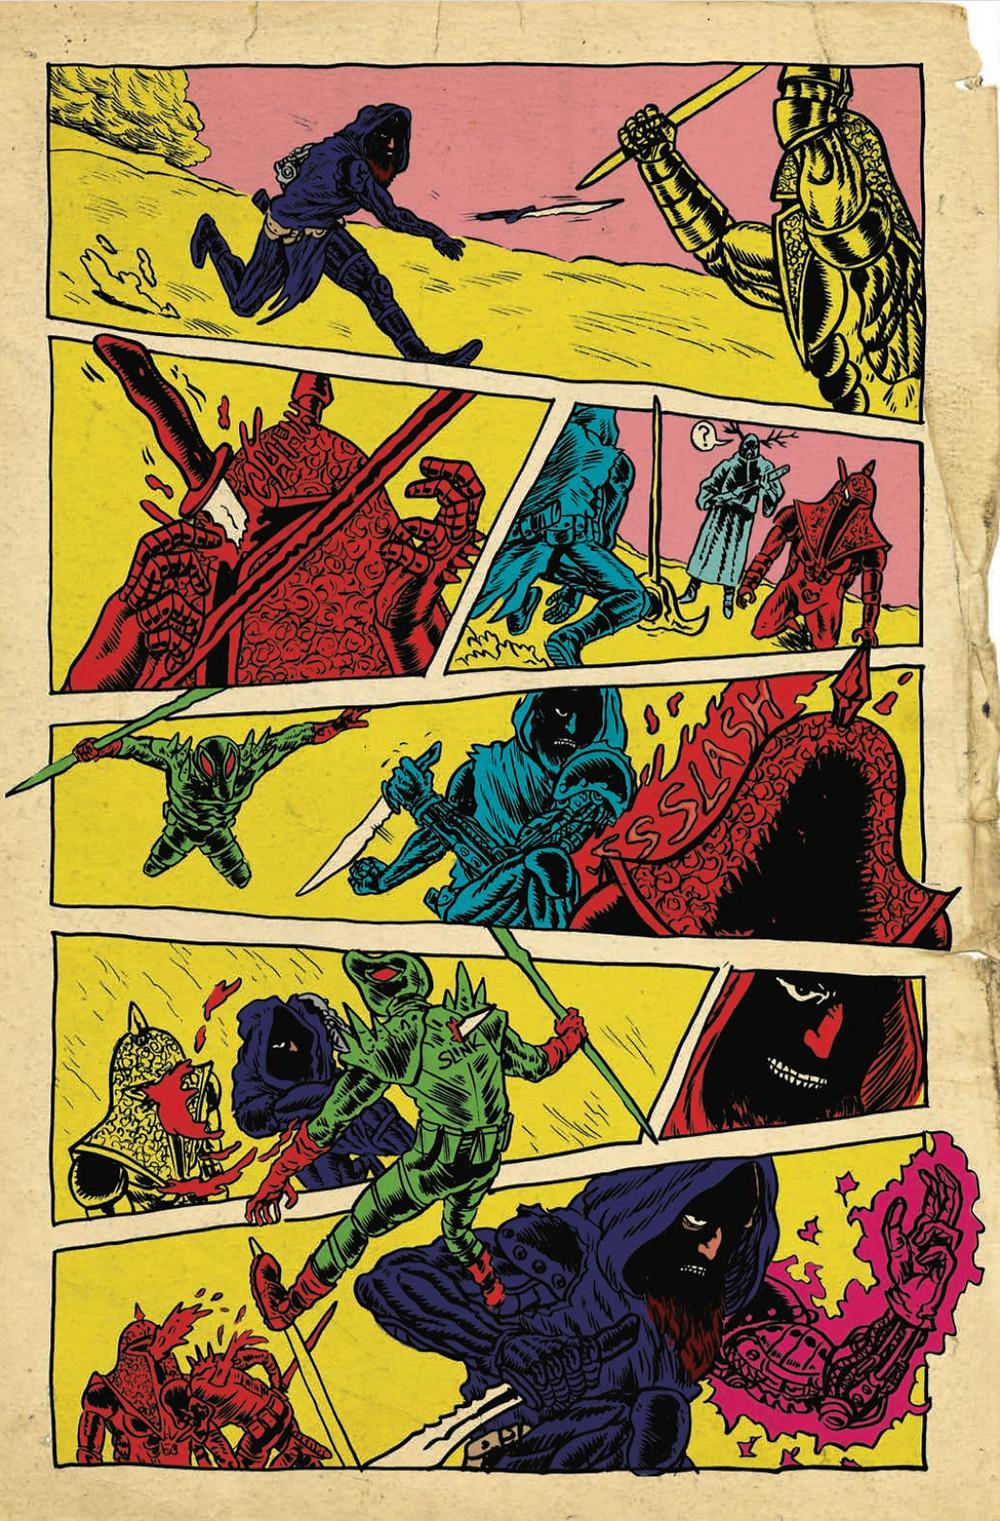 Space Riders, issue #1, page 4, Black Mask Studios, Giffoni/Ziritt